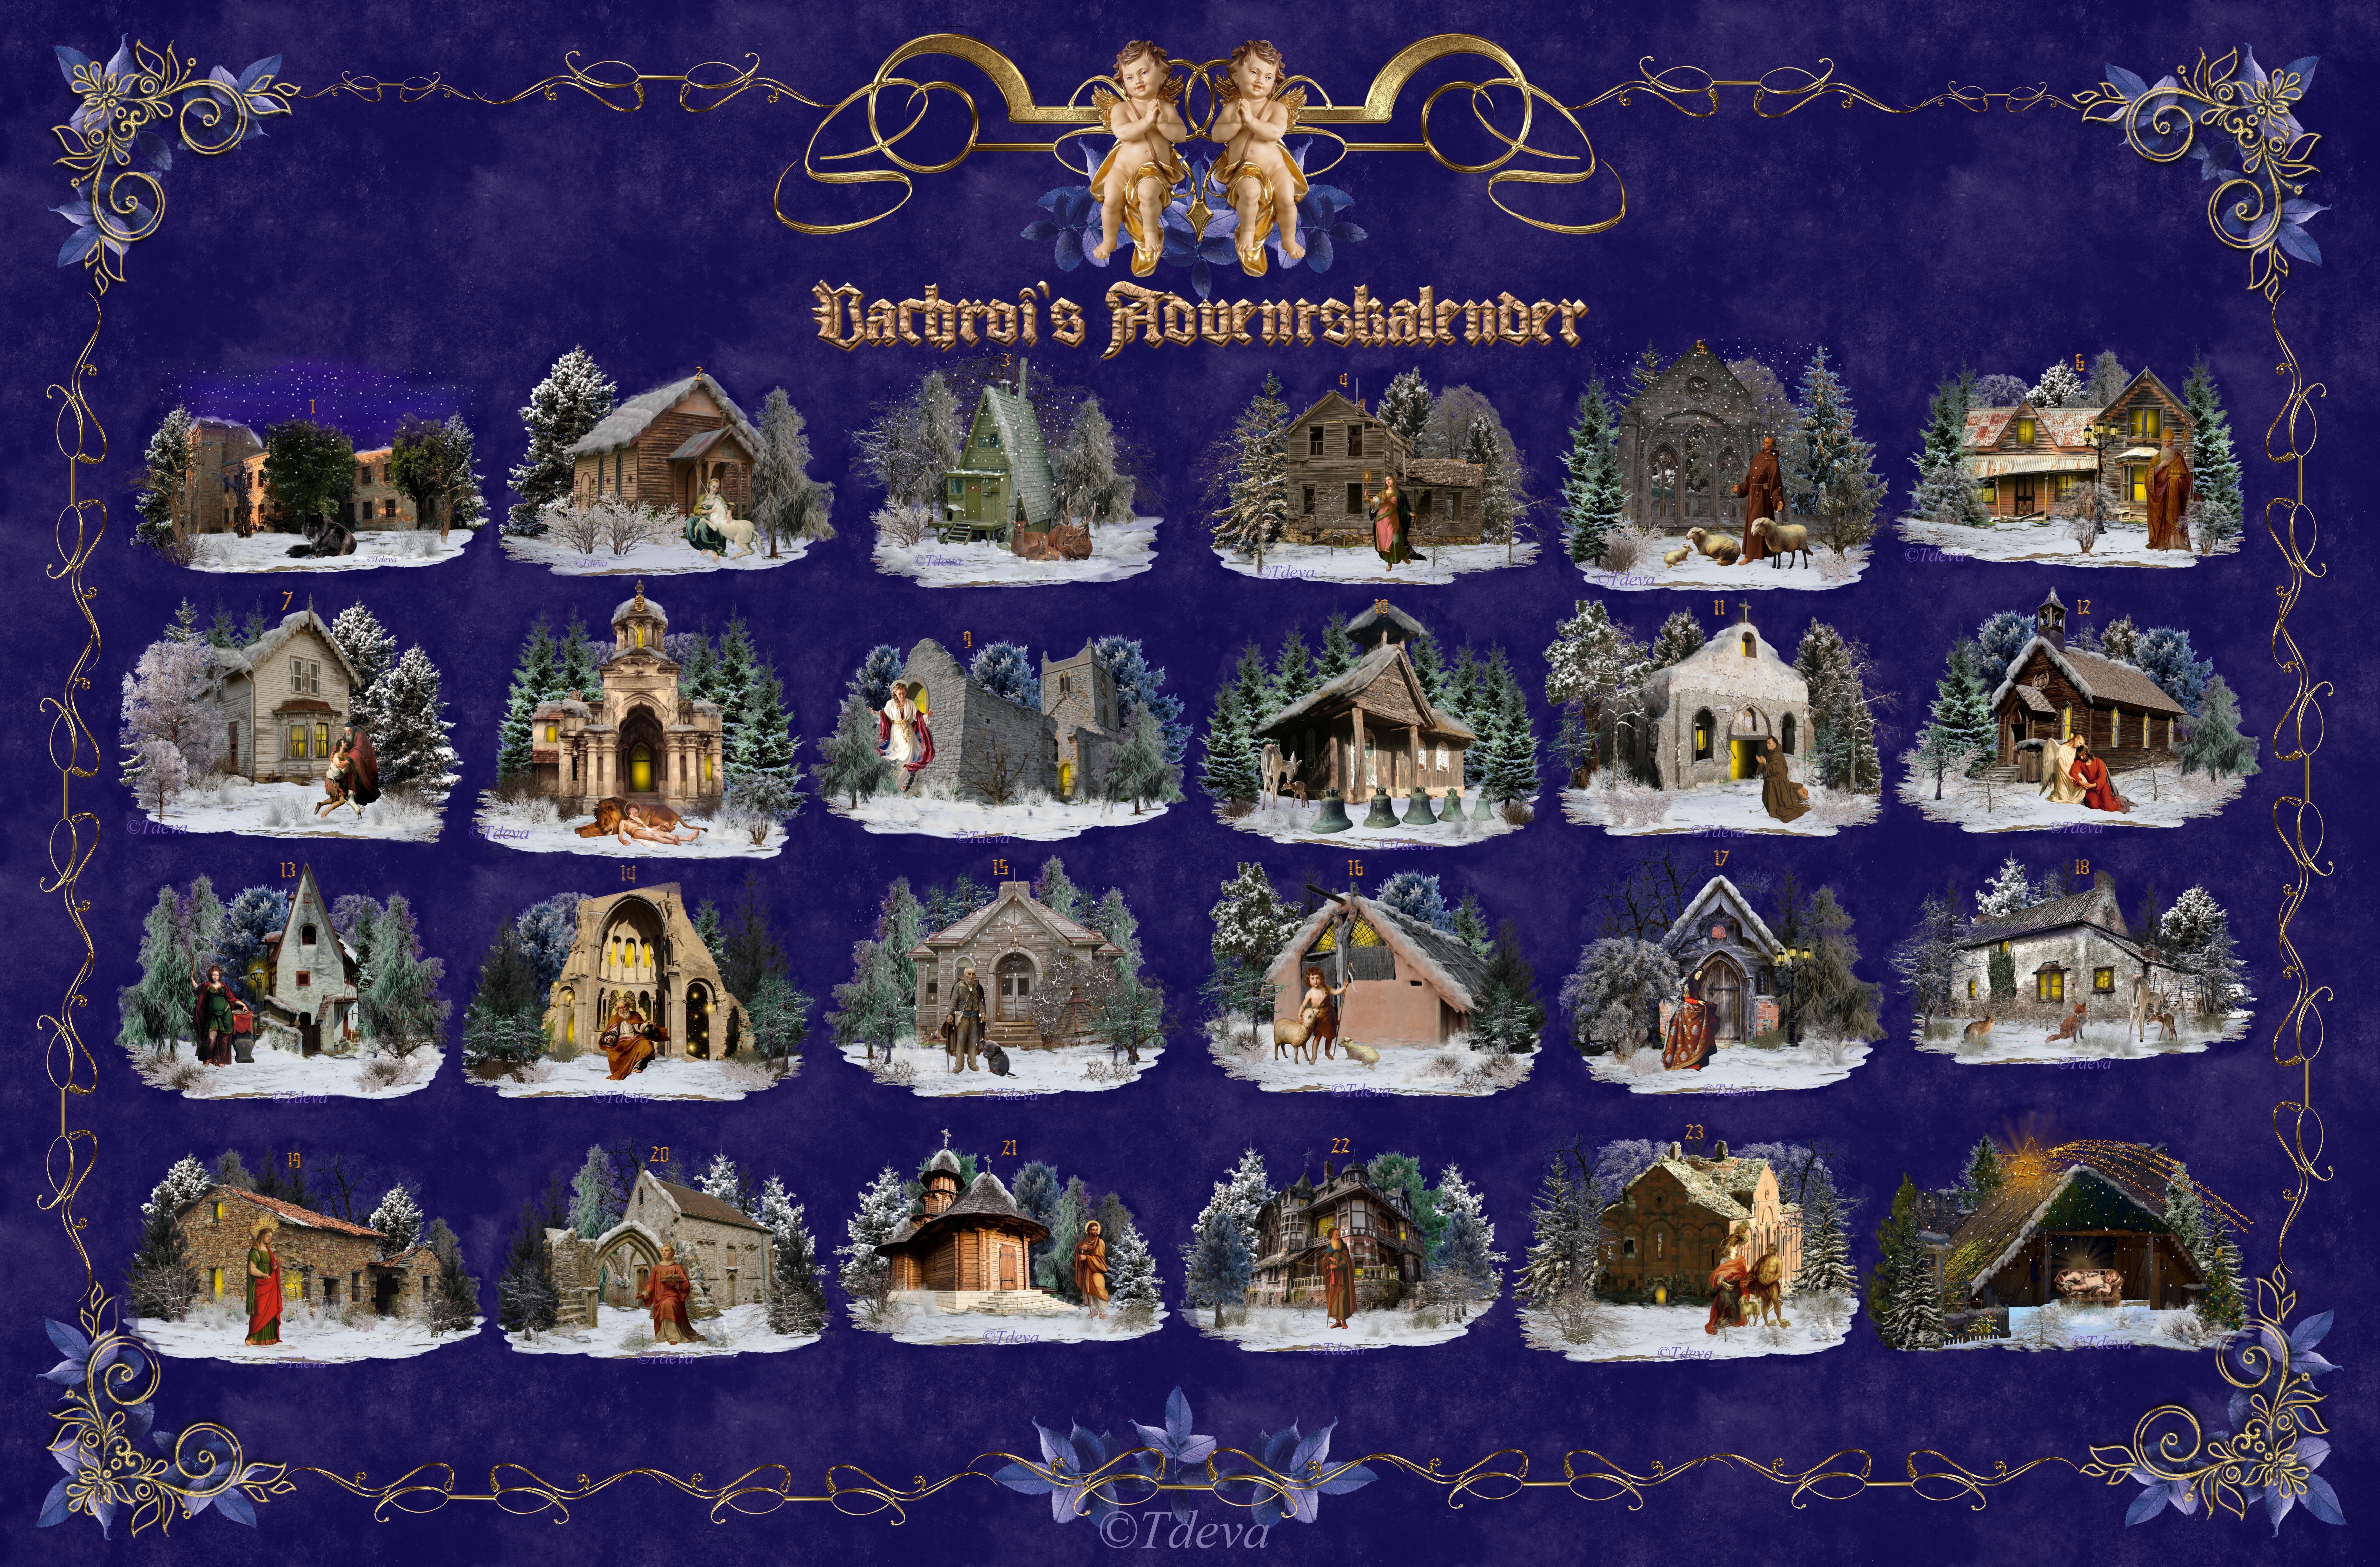 Vachroi's Adventskalender 2015